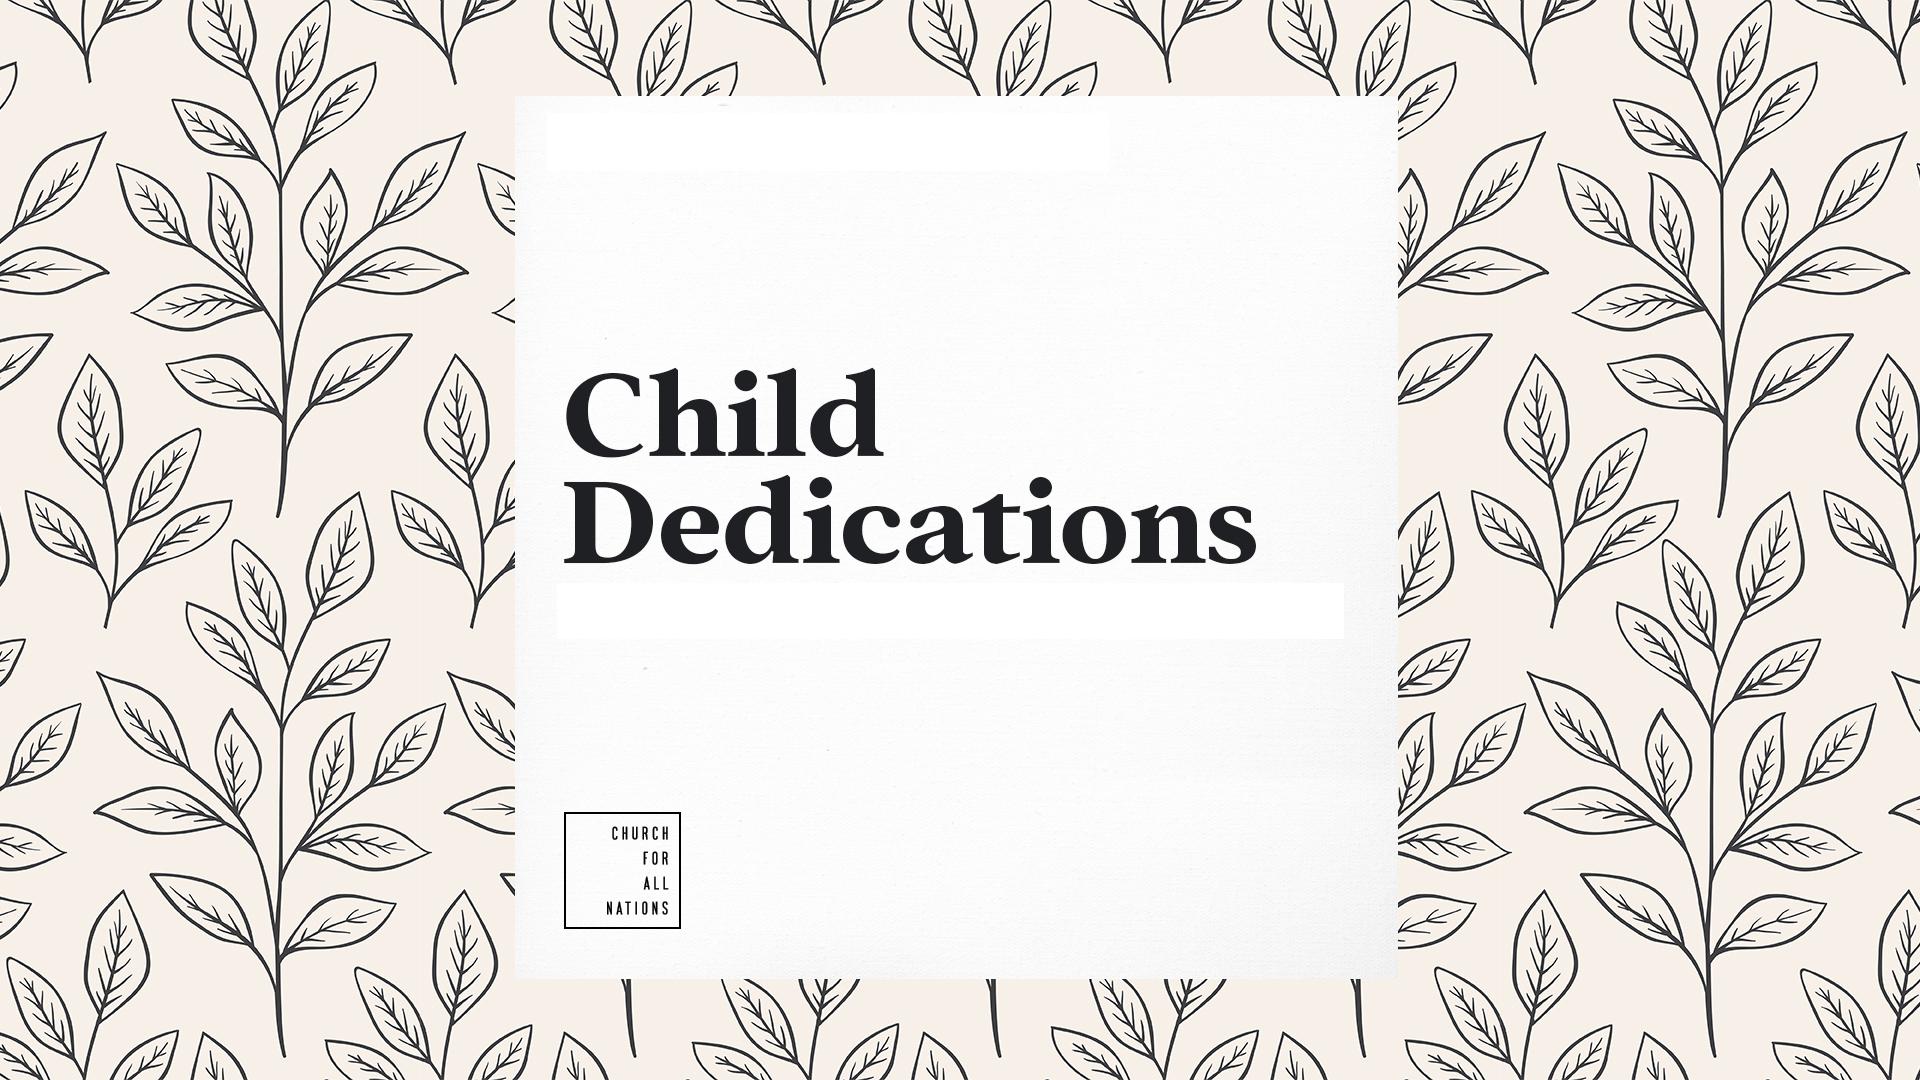 ChildDedications_BlankSlide.jpg